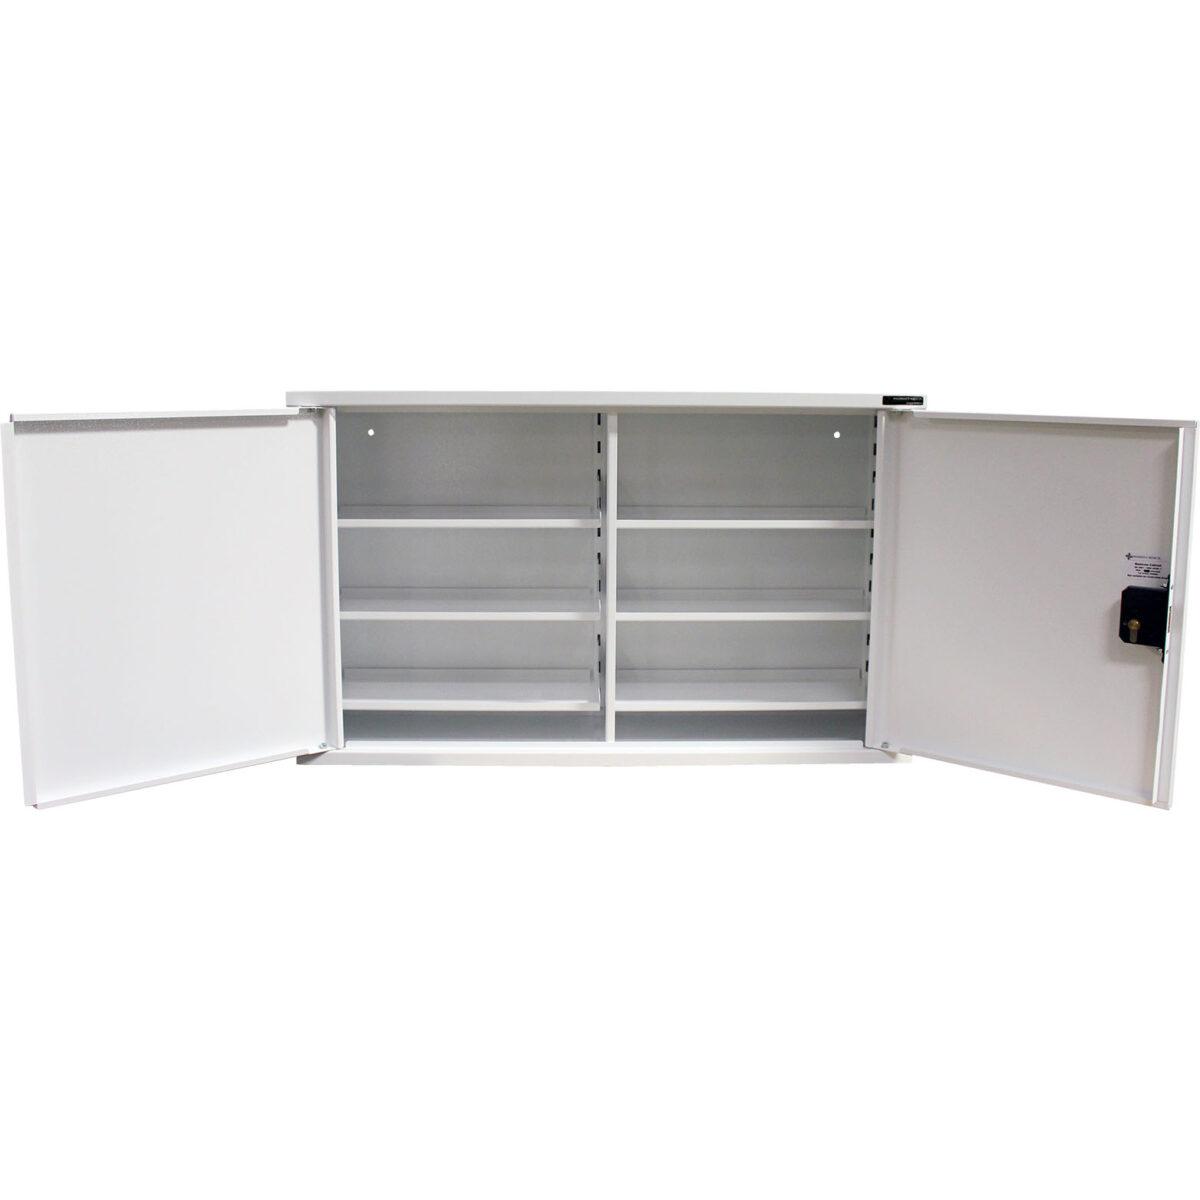 HECMC403 Medicine cabinet